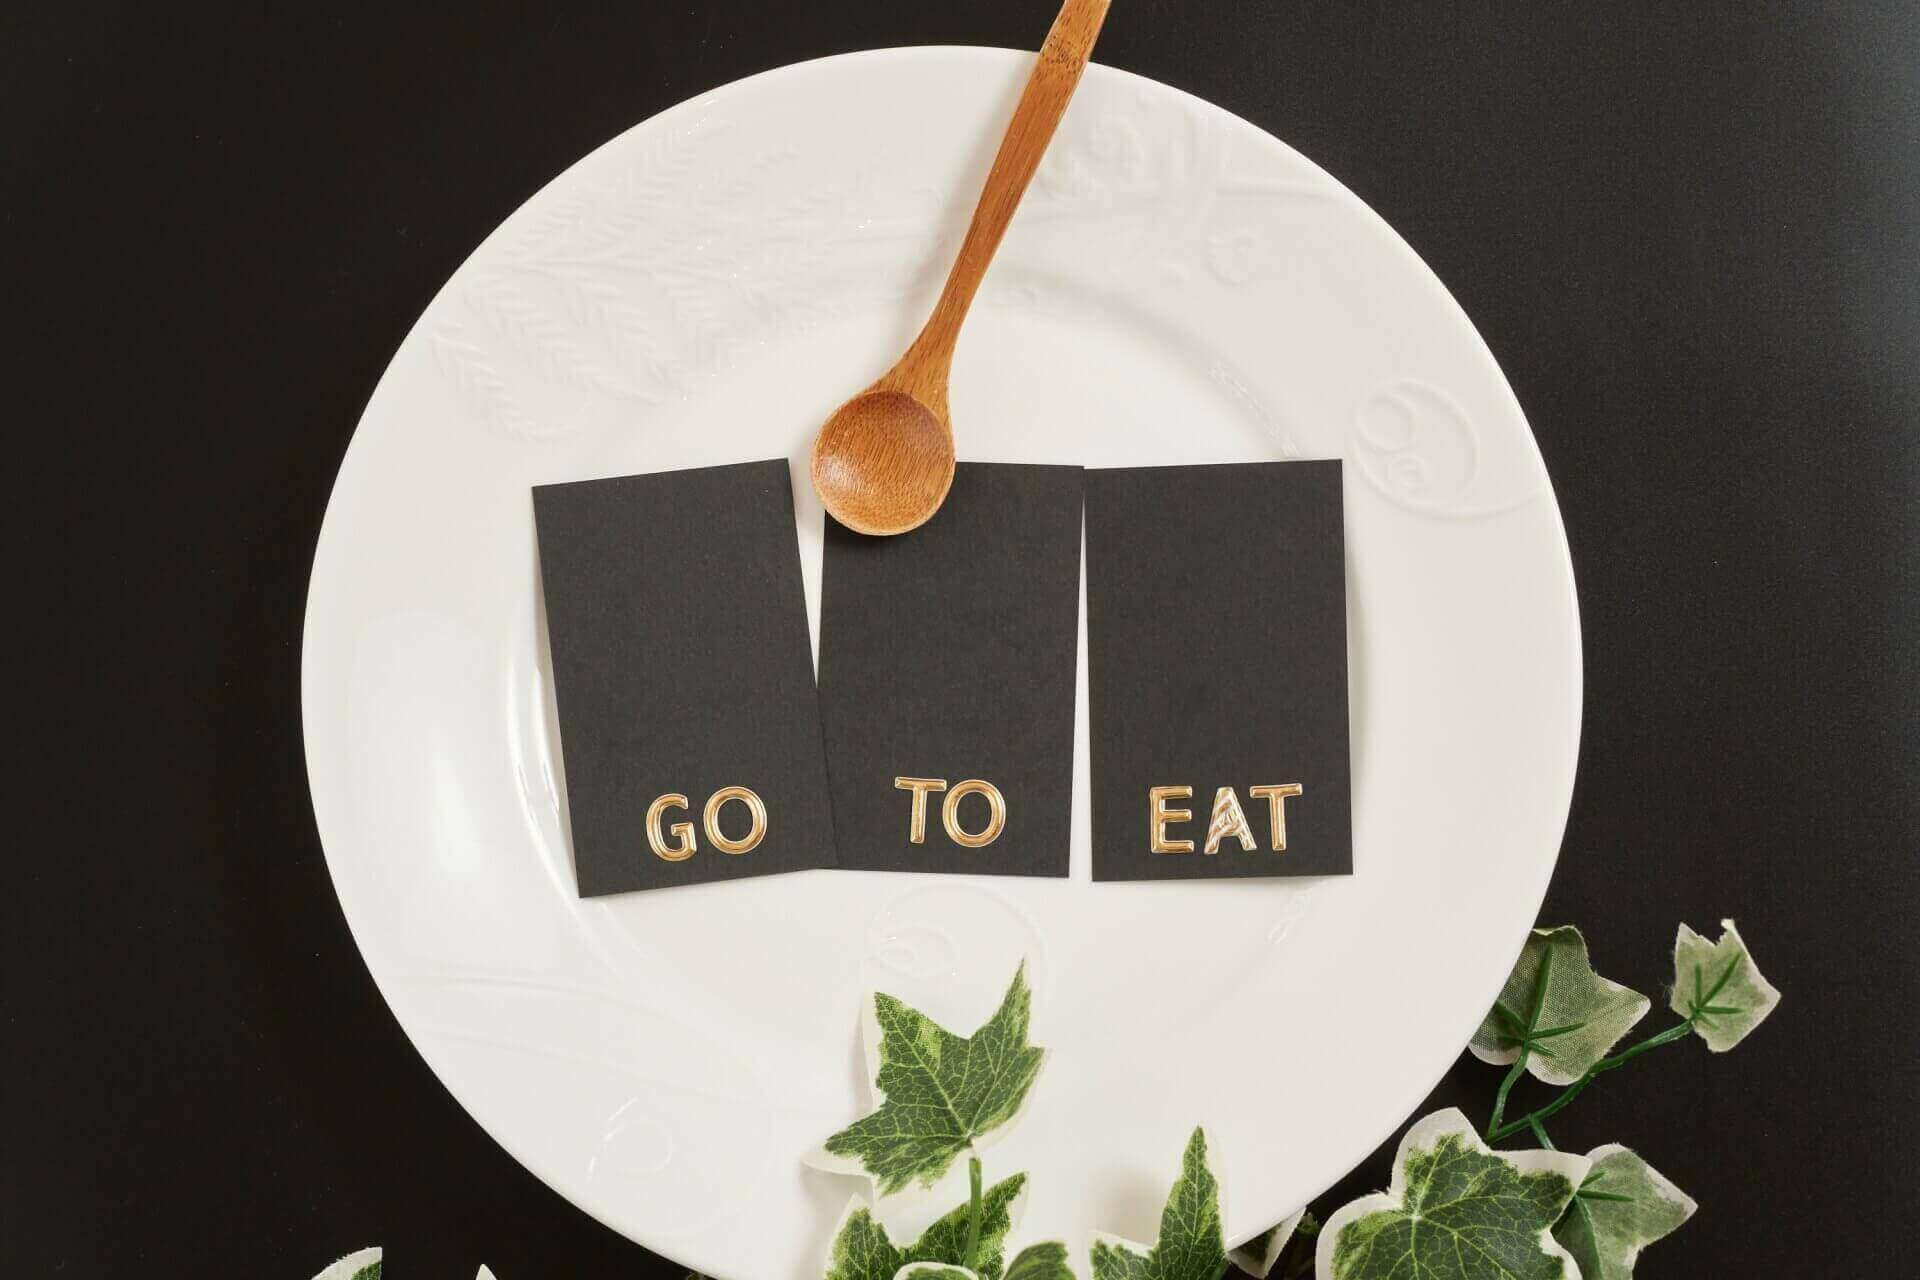 GoToEatのポイントはいつまで?延長についても一休/epark/食べログなど全てのサイトの期限調査!